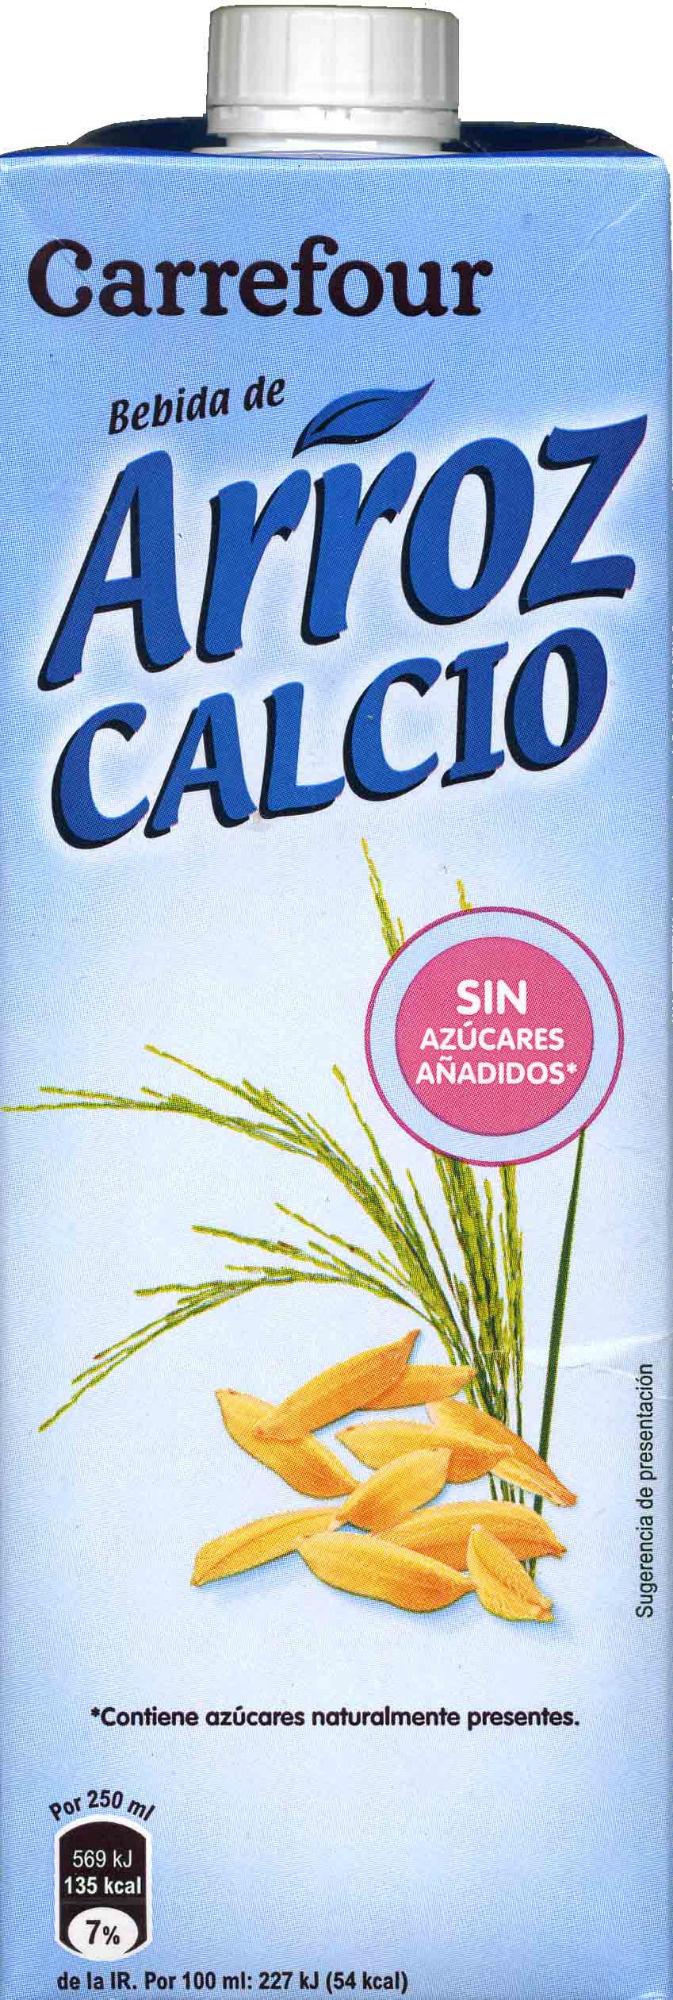 Leche de arroz calcio - Producto